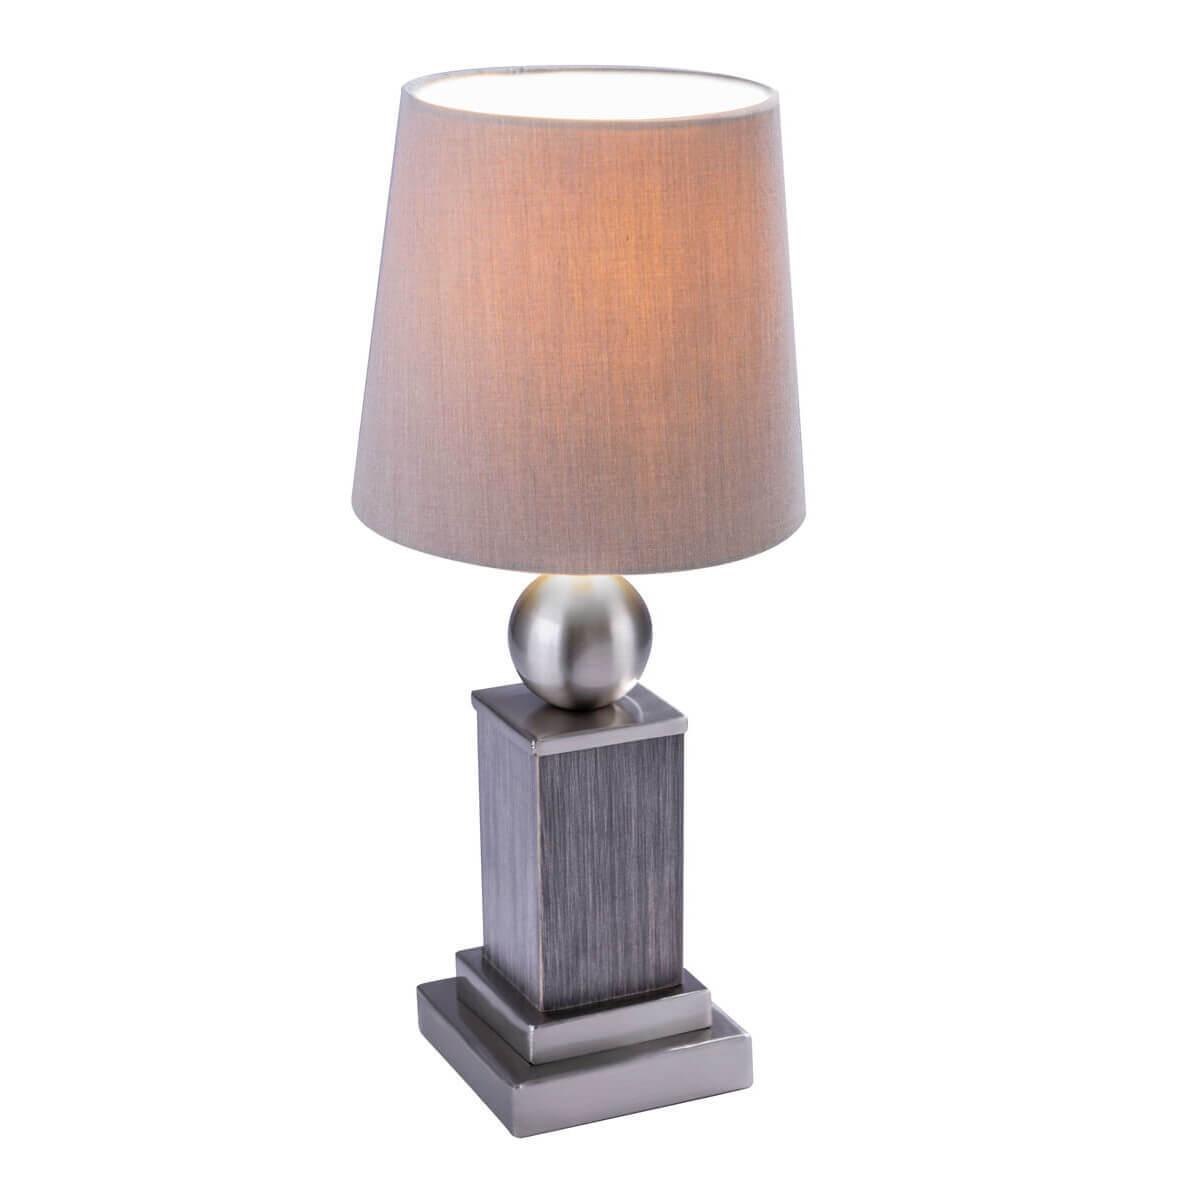 Настольная лампа Globo 24138 Rollo globo настольная лампа ночник globo 28033 12